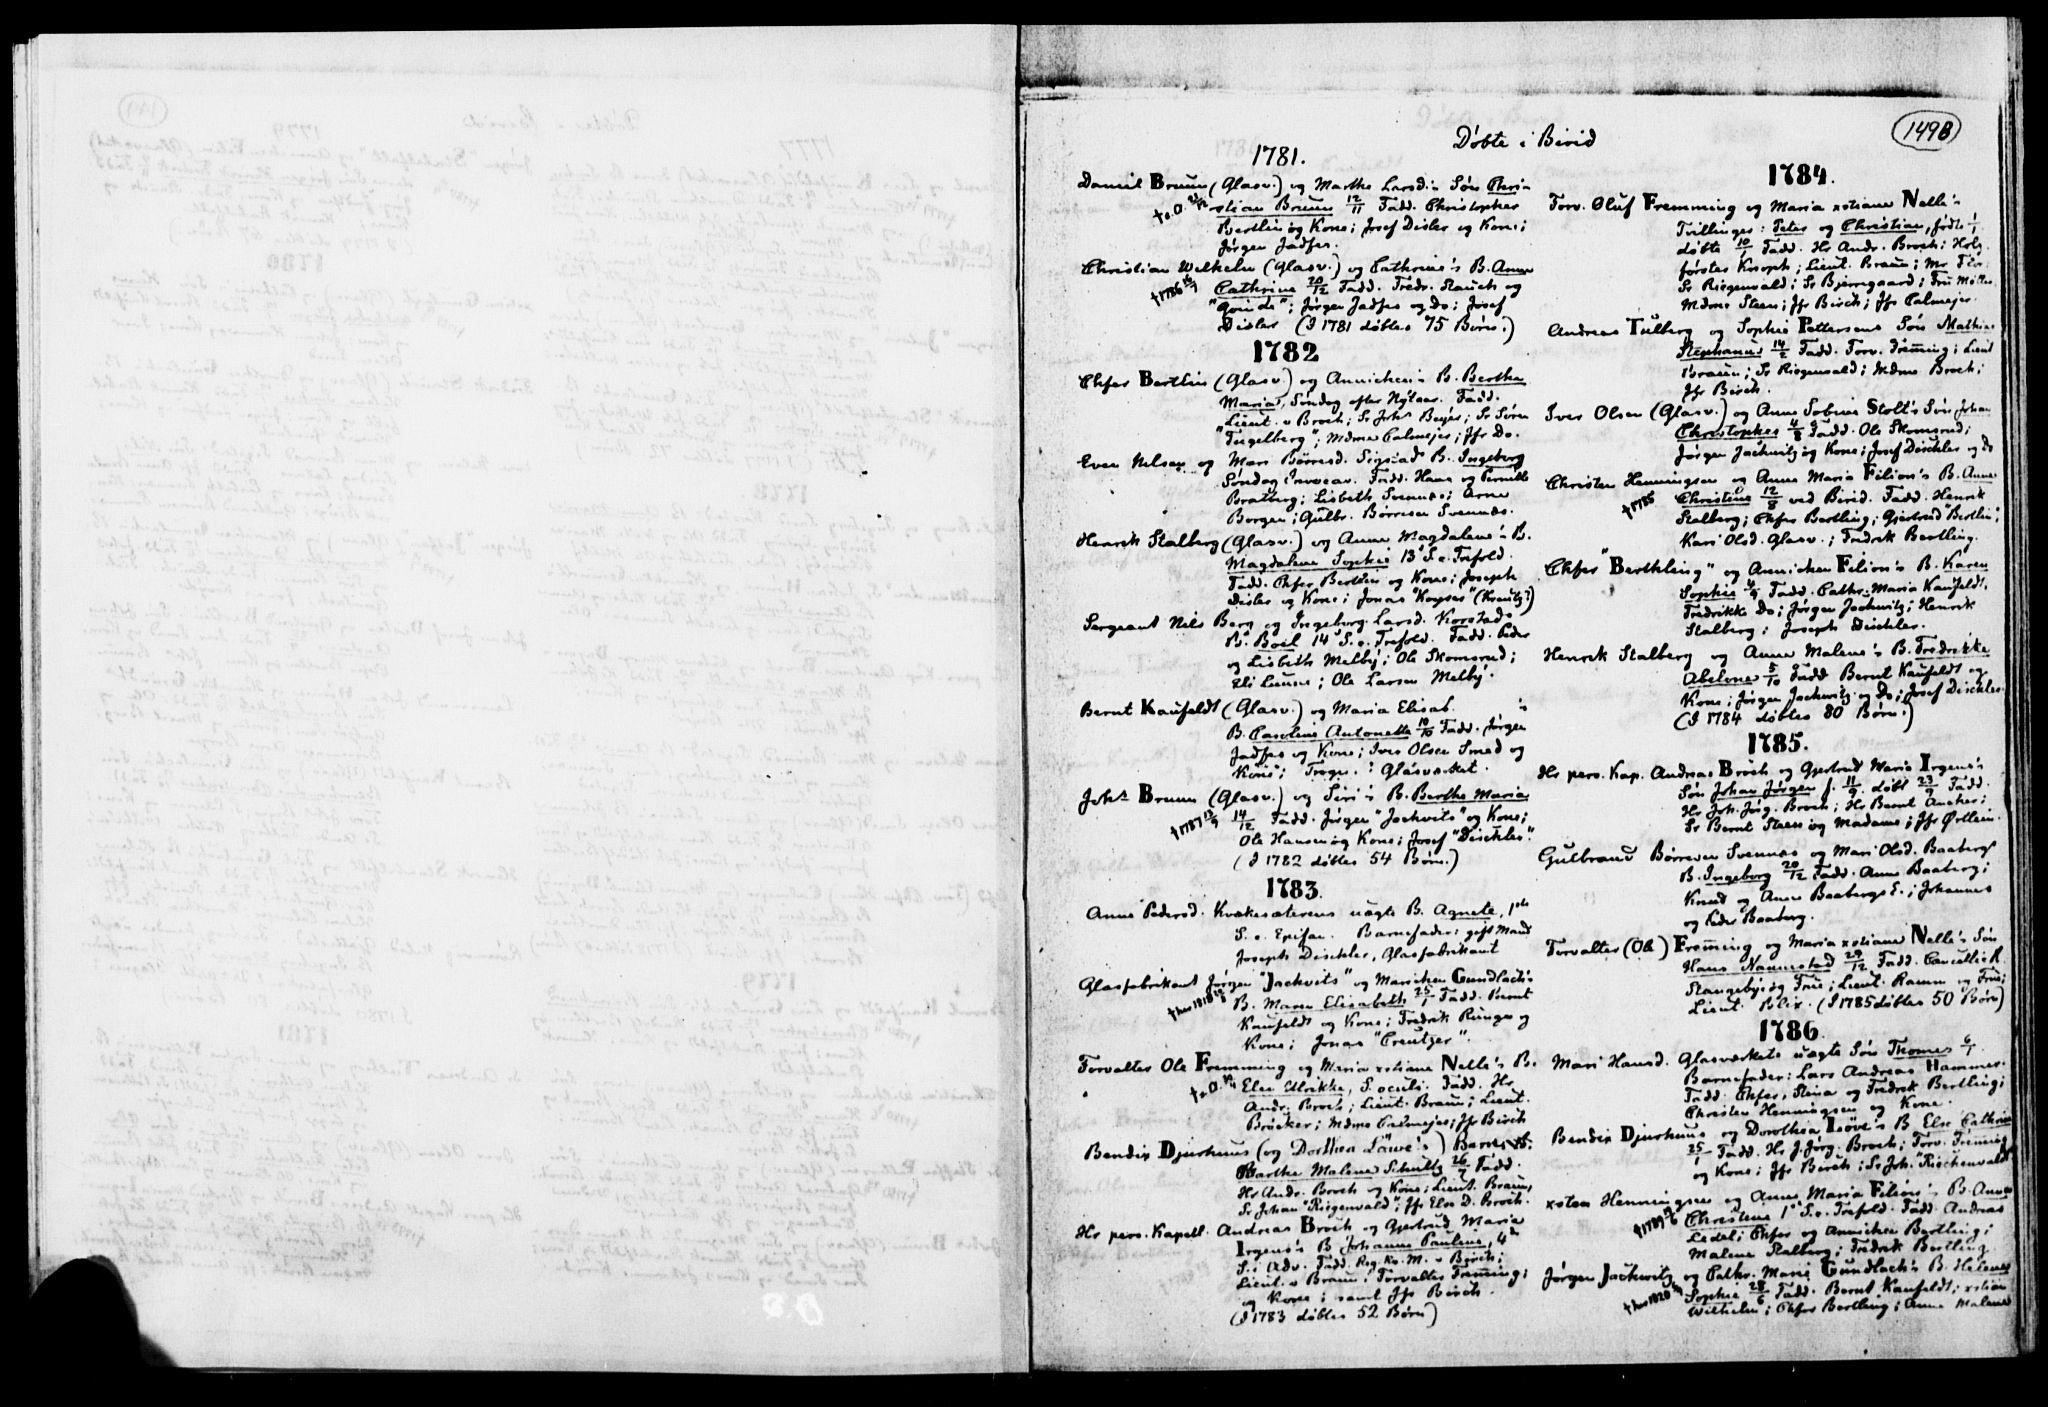 SAH, Biri prestekontor, Ministerialbok, 1730-1879, s. 149b